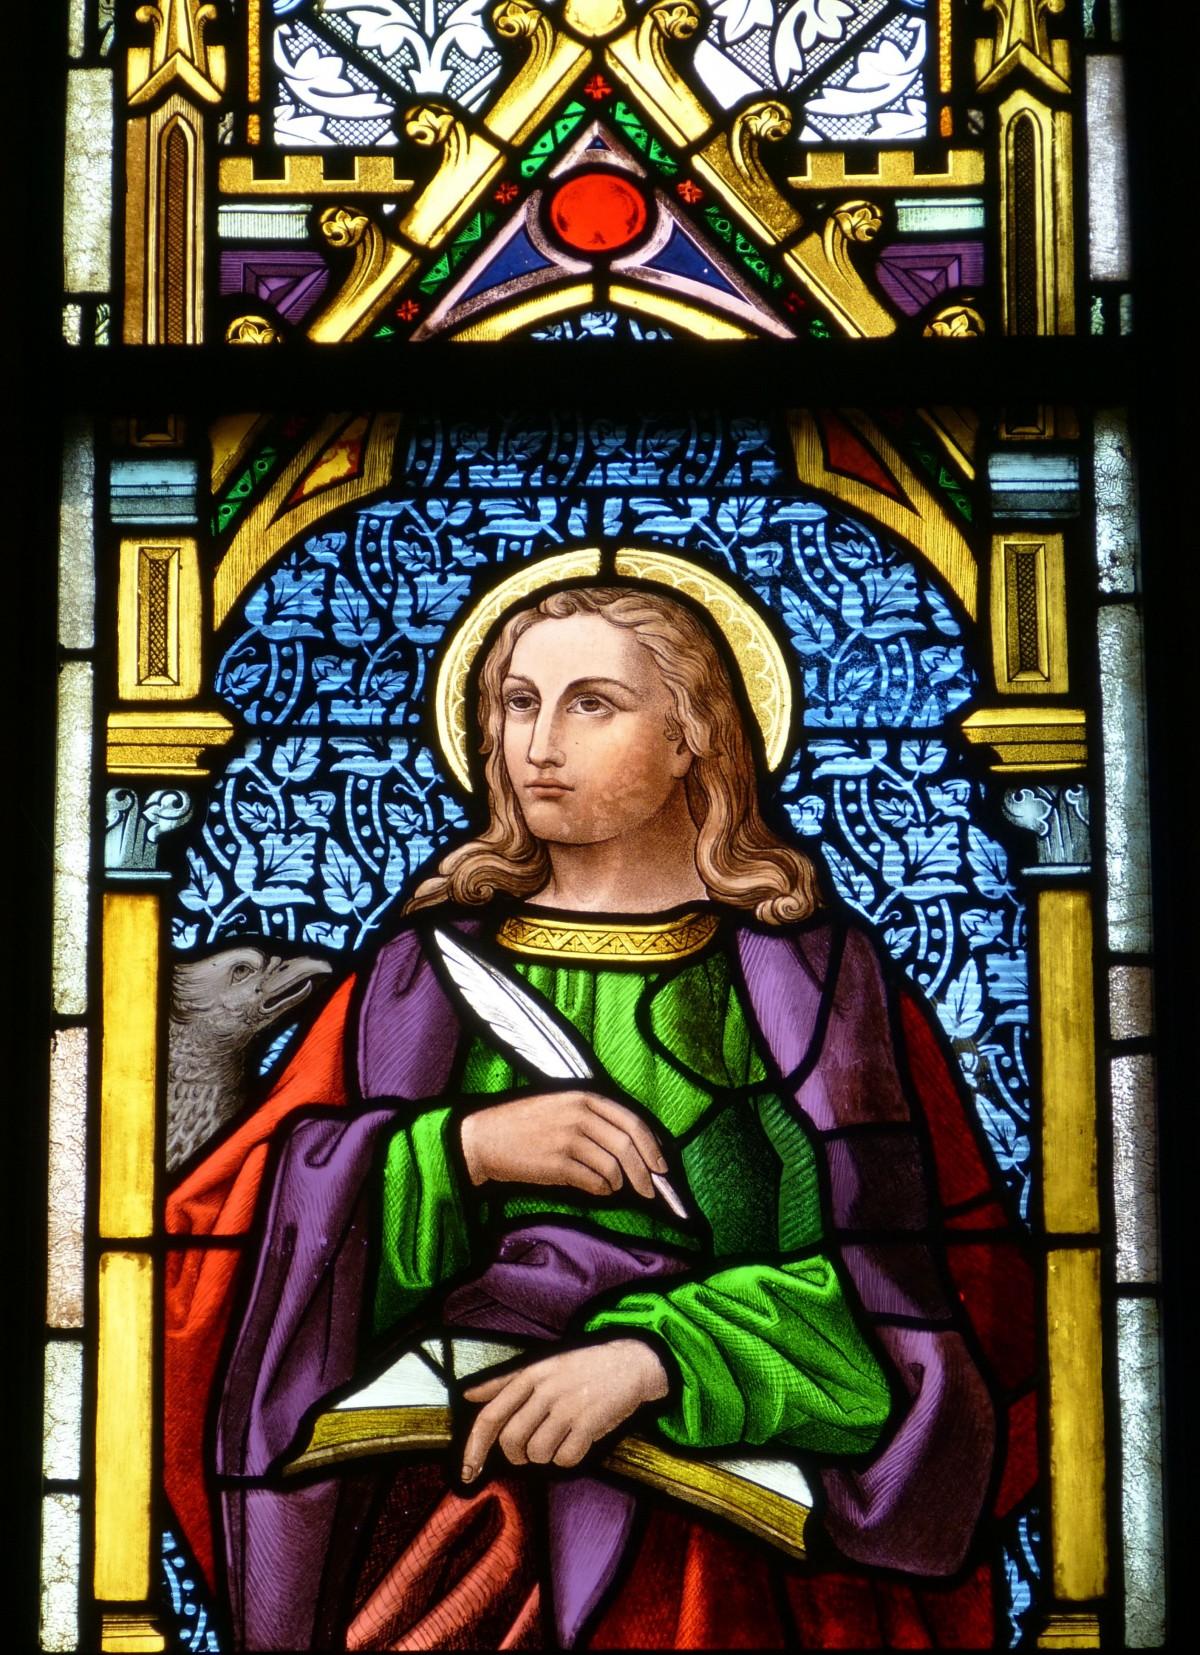 Gratis afbeeldingen kop kleur kerk materiaal glas in lood bijbel geloof christendom - Geloof glas ingerichte ...